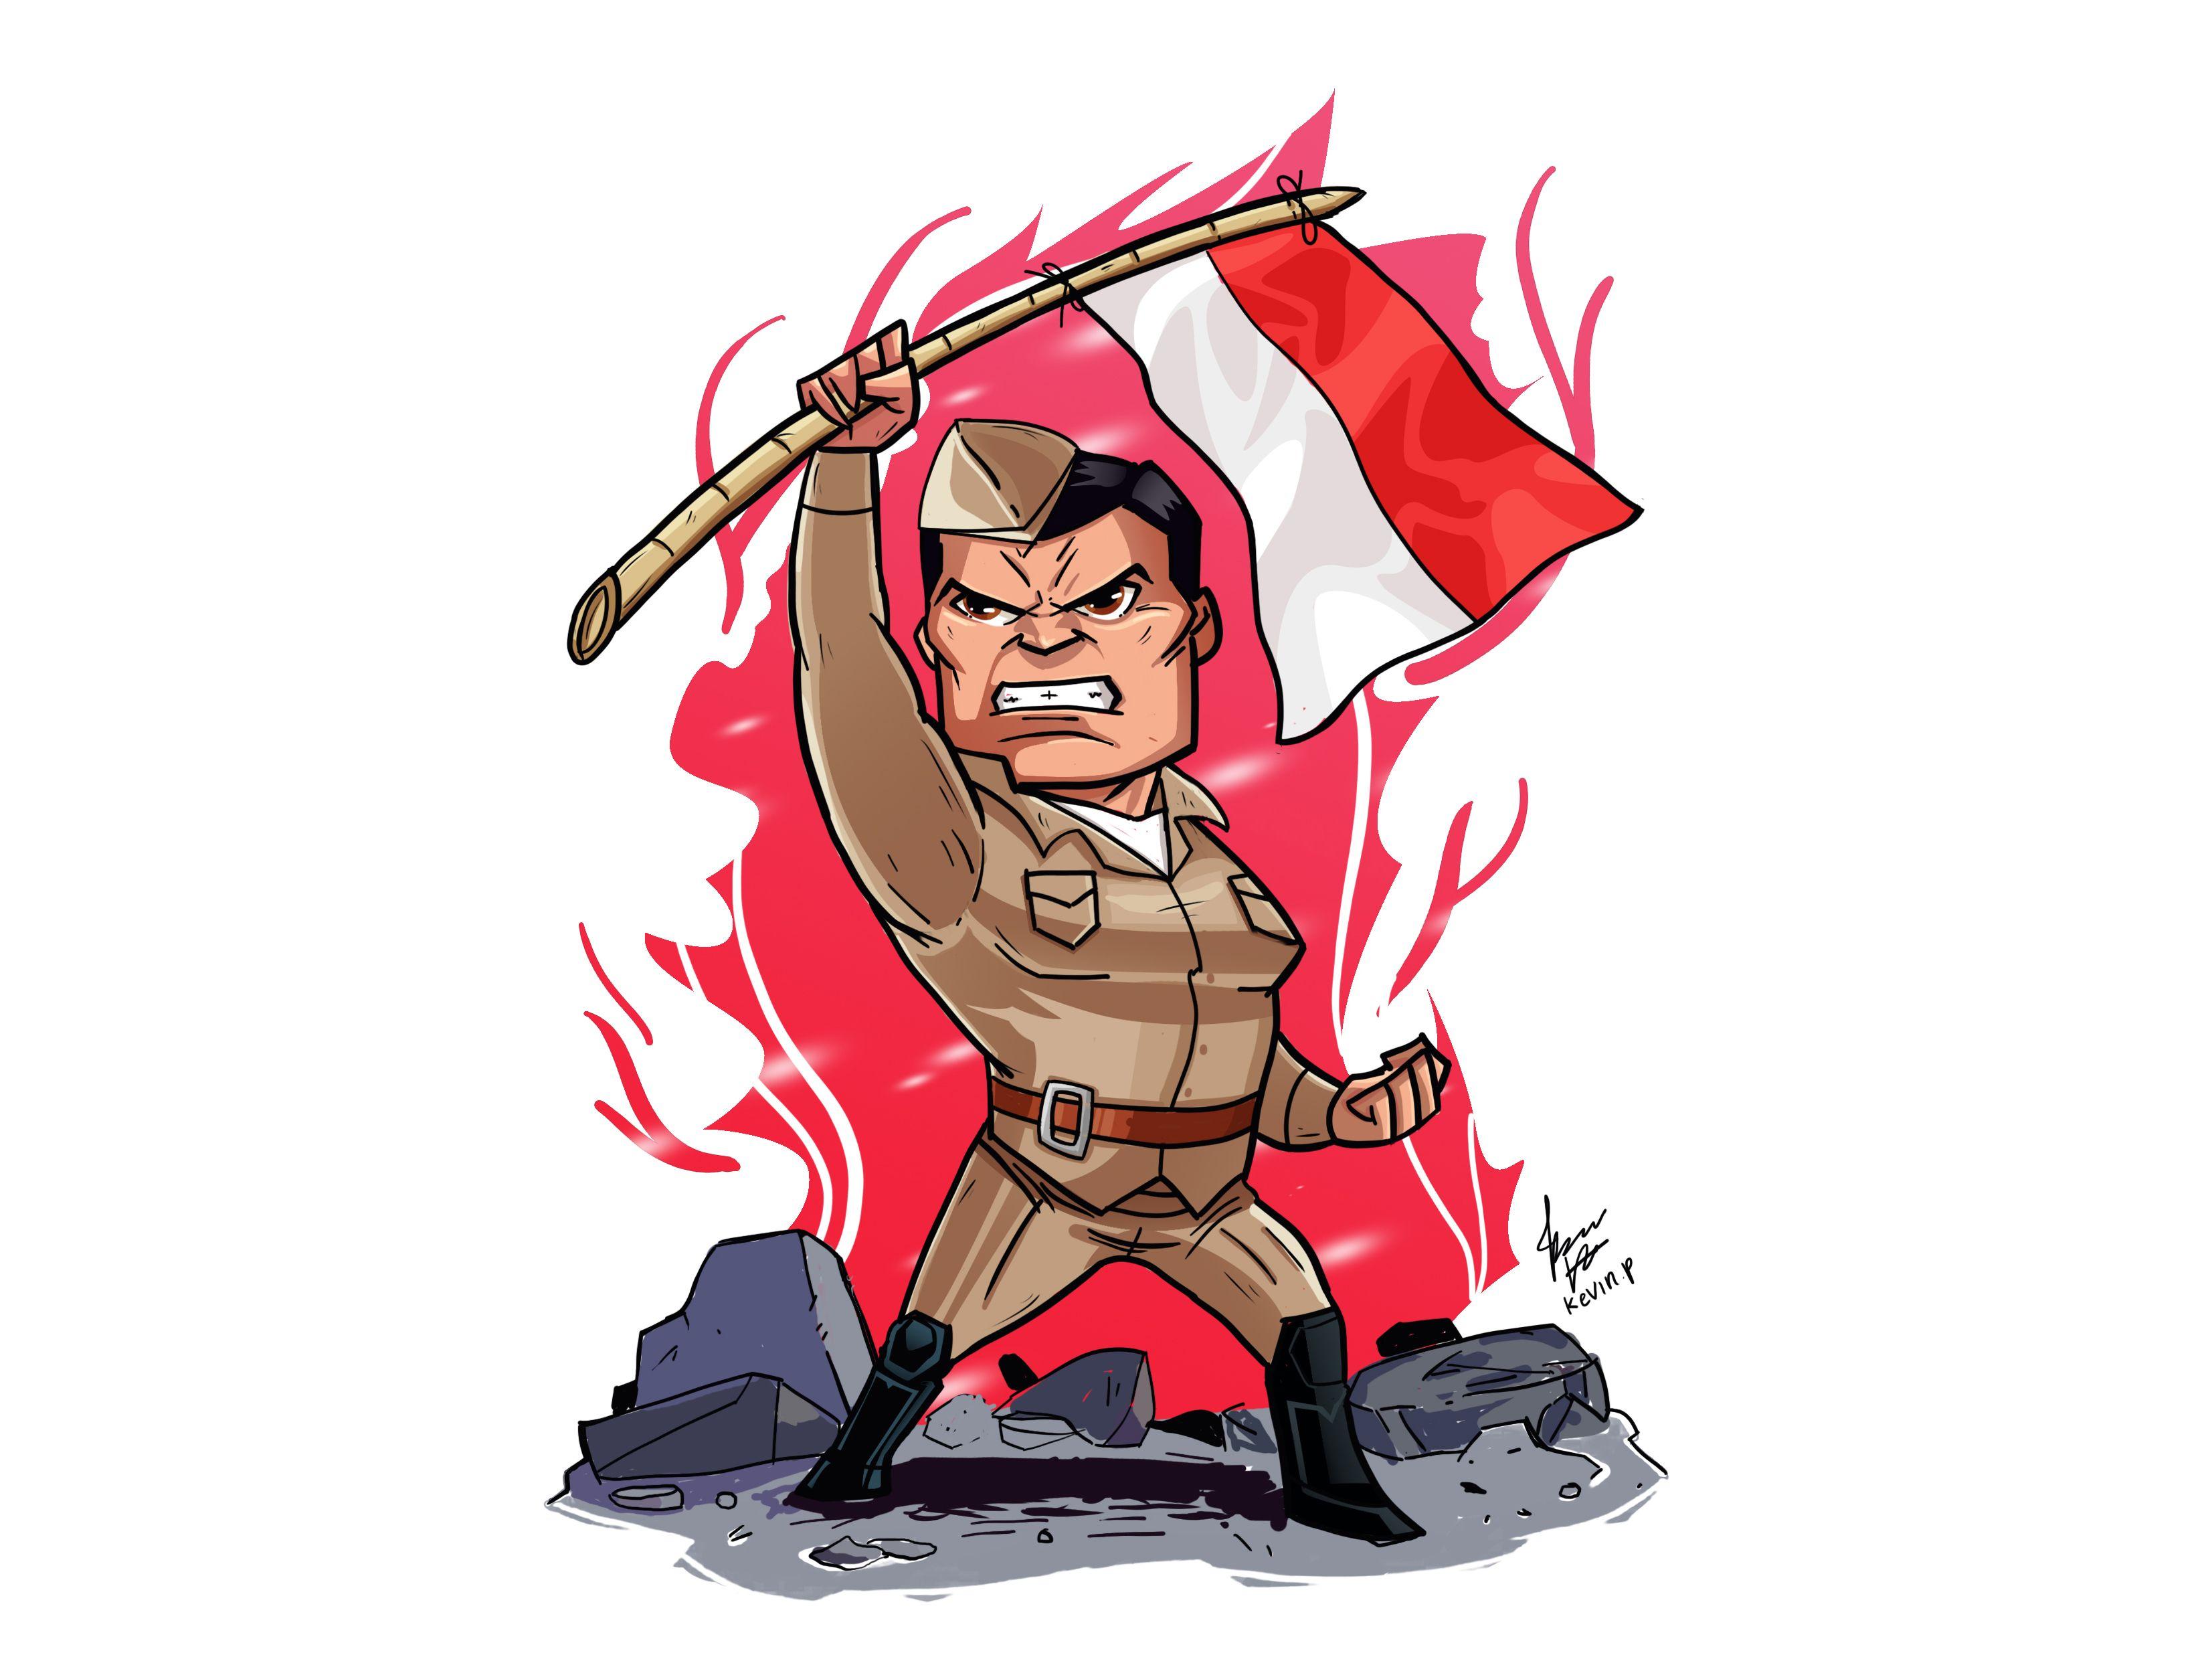 Gambar Animasi Pahlawan Kemerdekaan